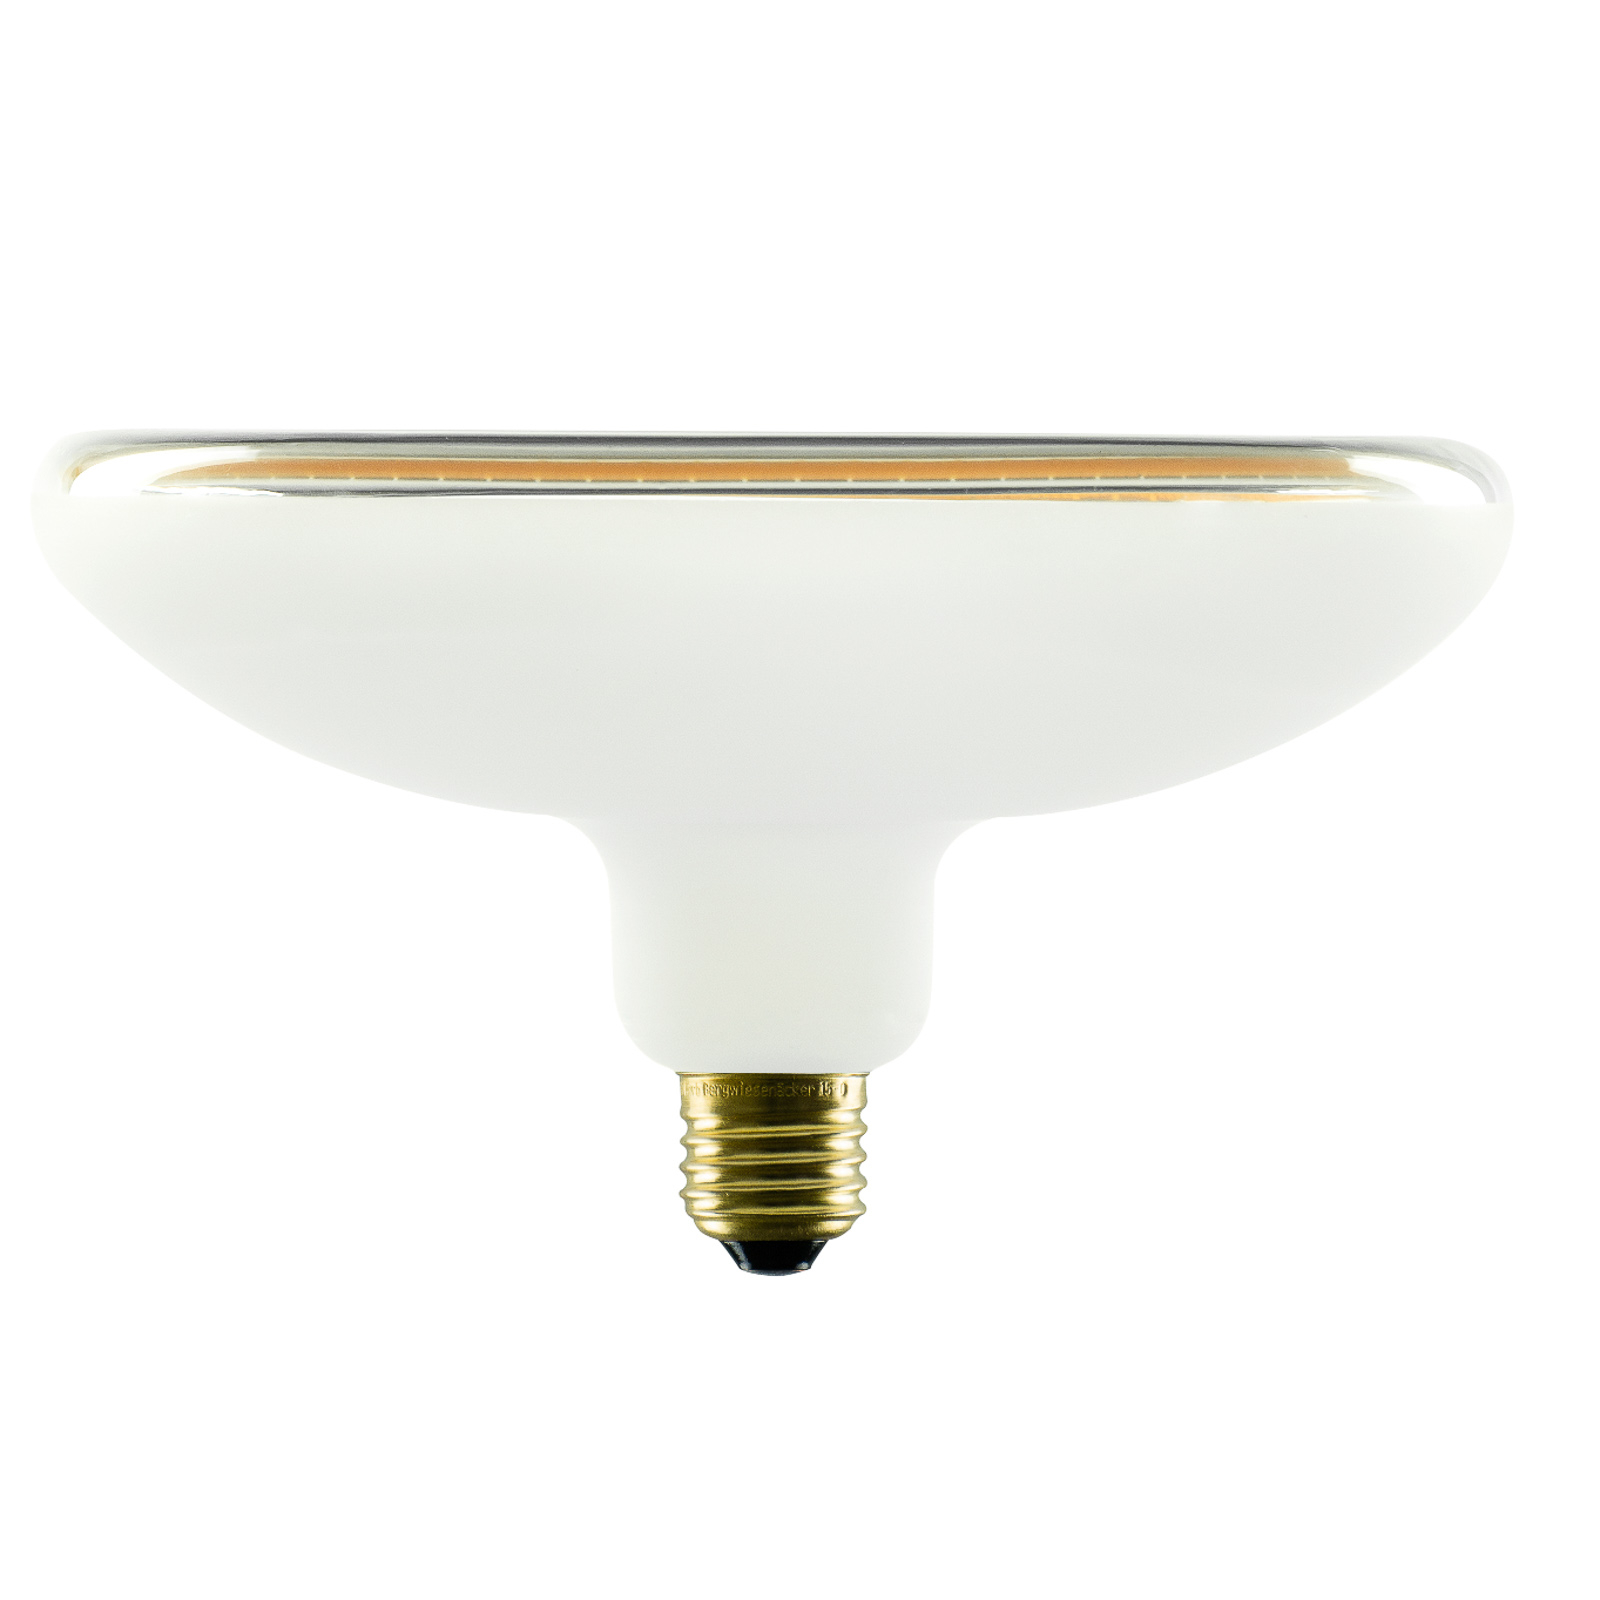 SEGULA LED-Floating-Reflektor R200 E27 8W opal